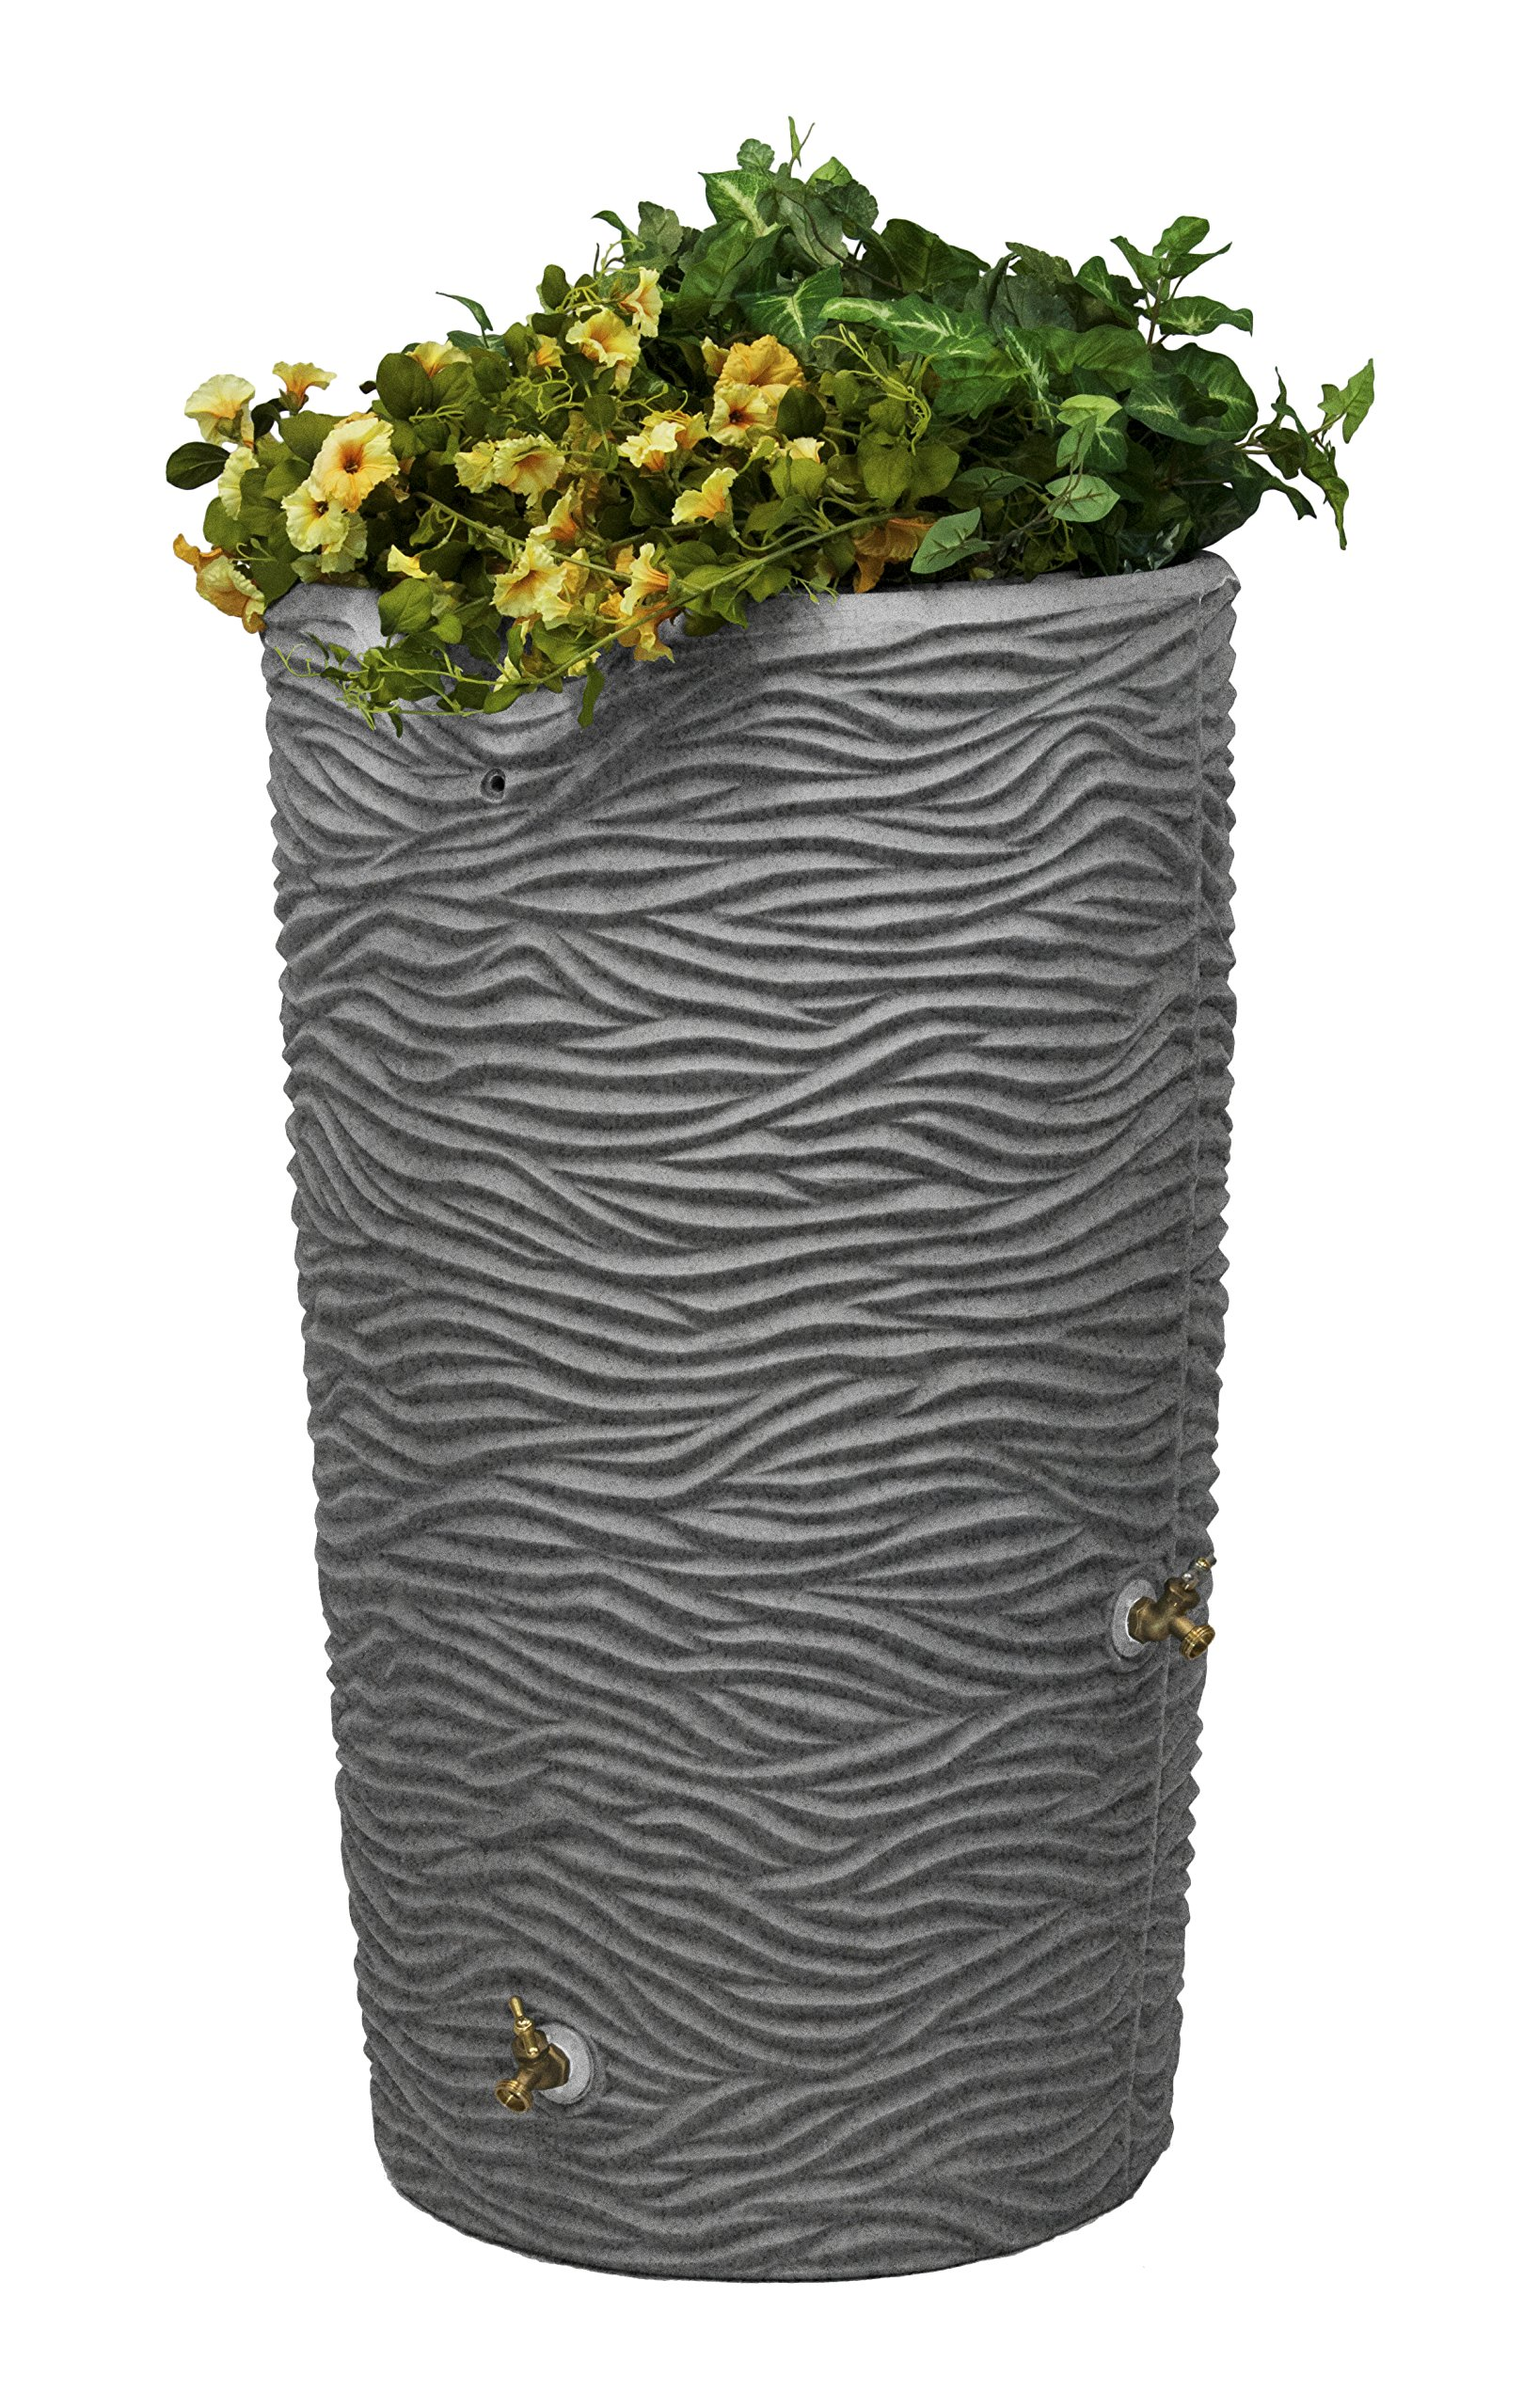 Good Ideas IMP-L65-LIG Impressions Palm Rain Saver, 65-Gallon, Light Granite